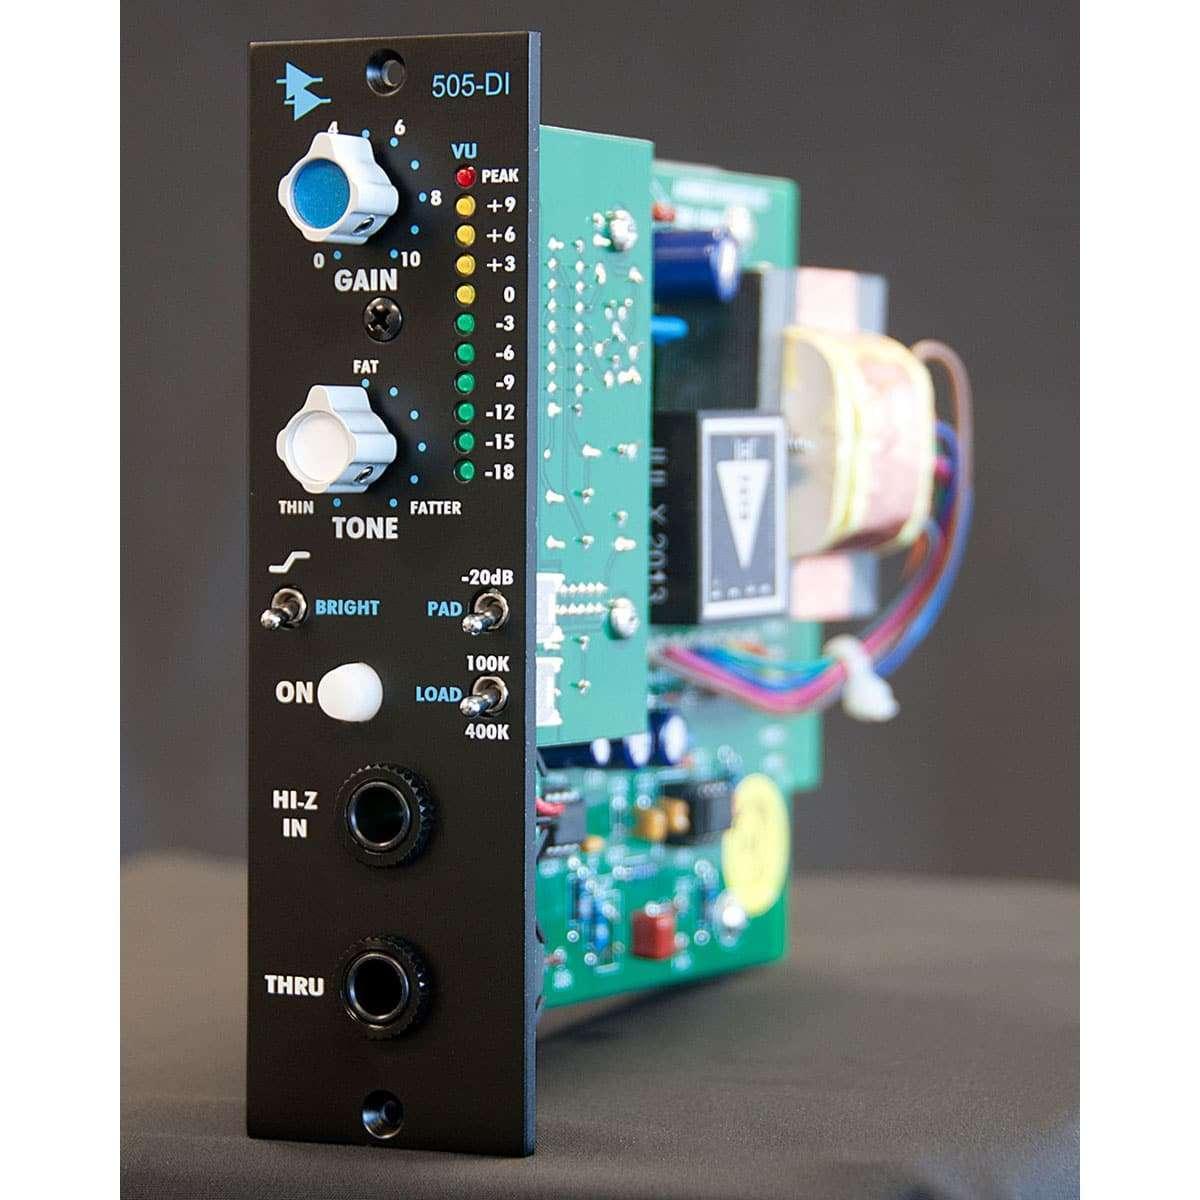 API 505 DI 02 D.I./Reamp, Outboard, Pro Audio